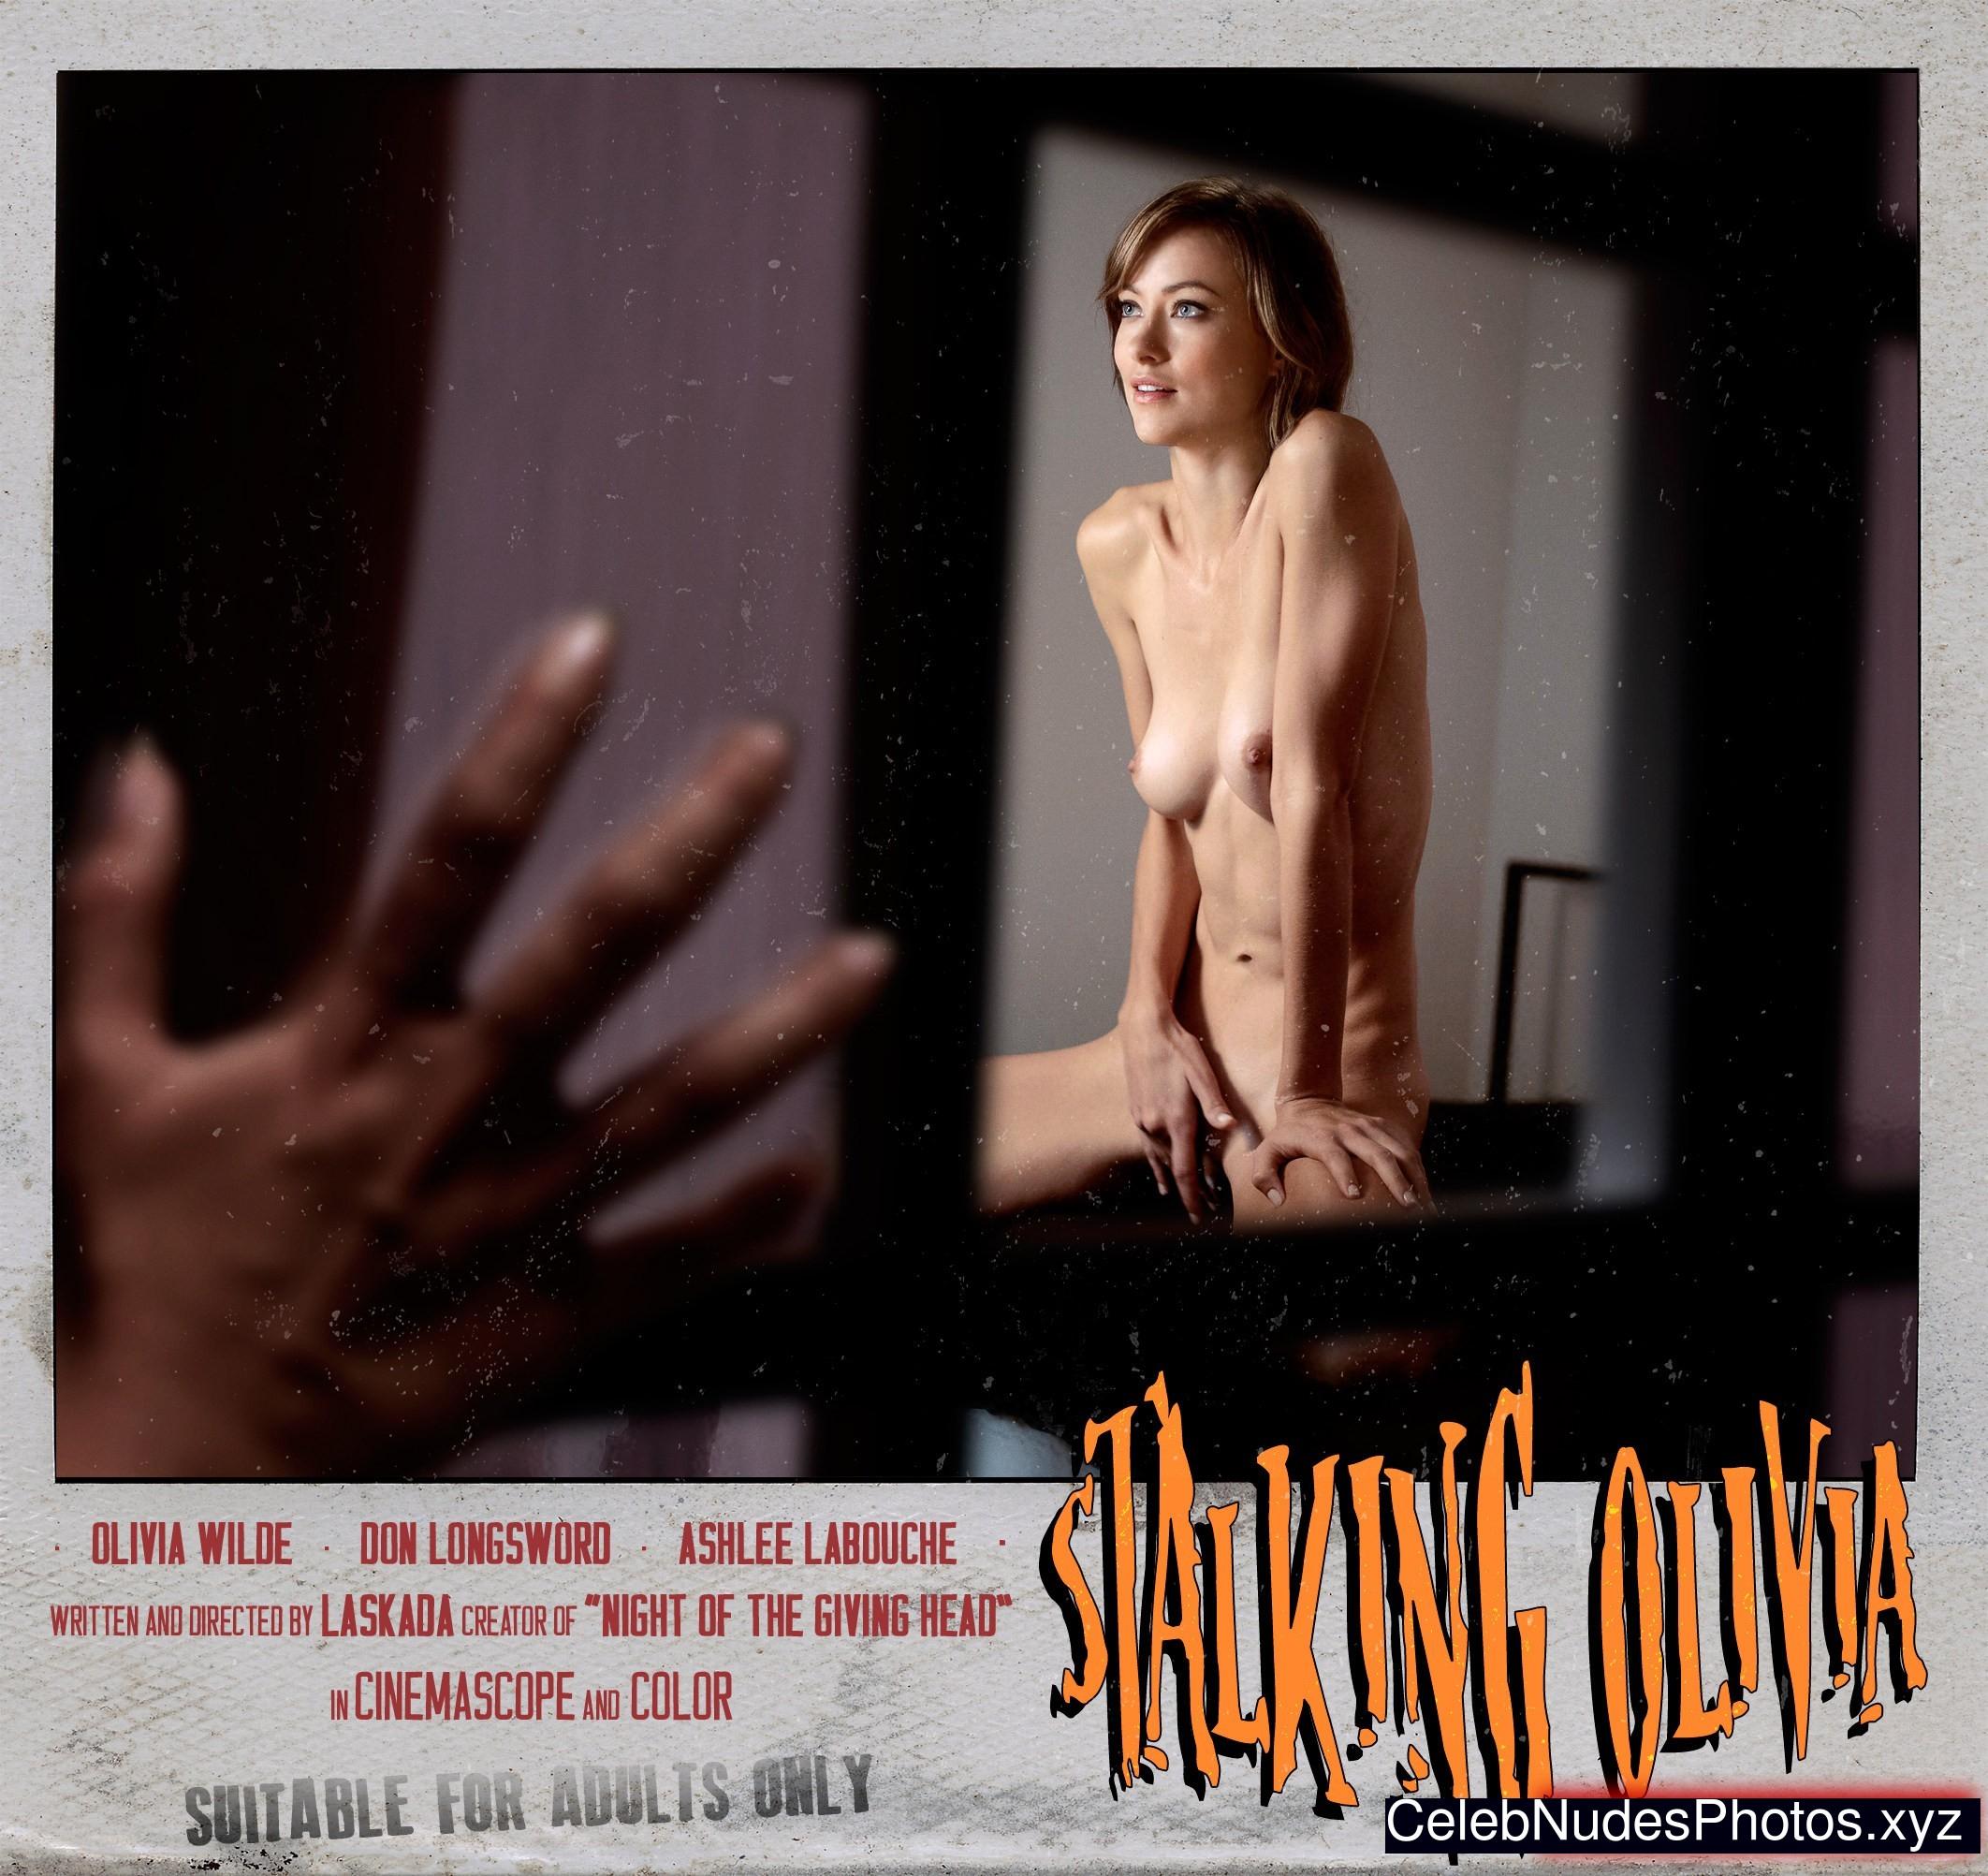 Olivia Wilde naked celebrity pics